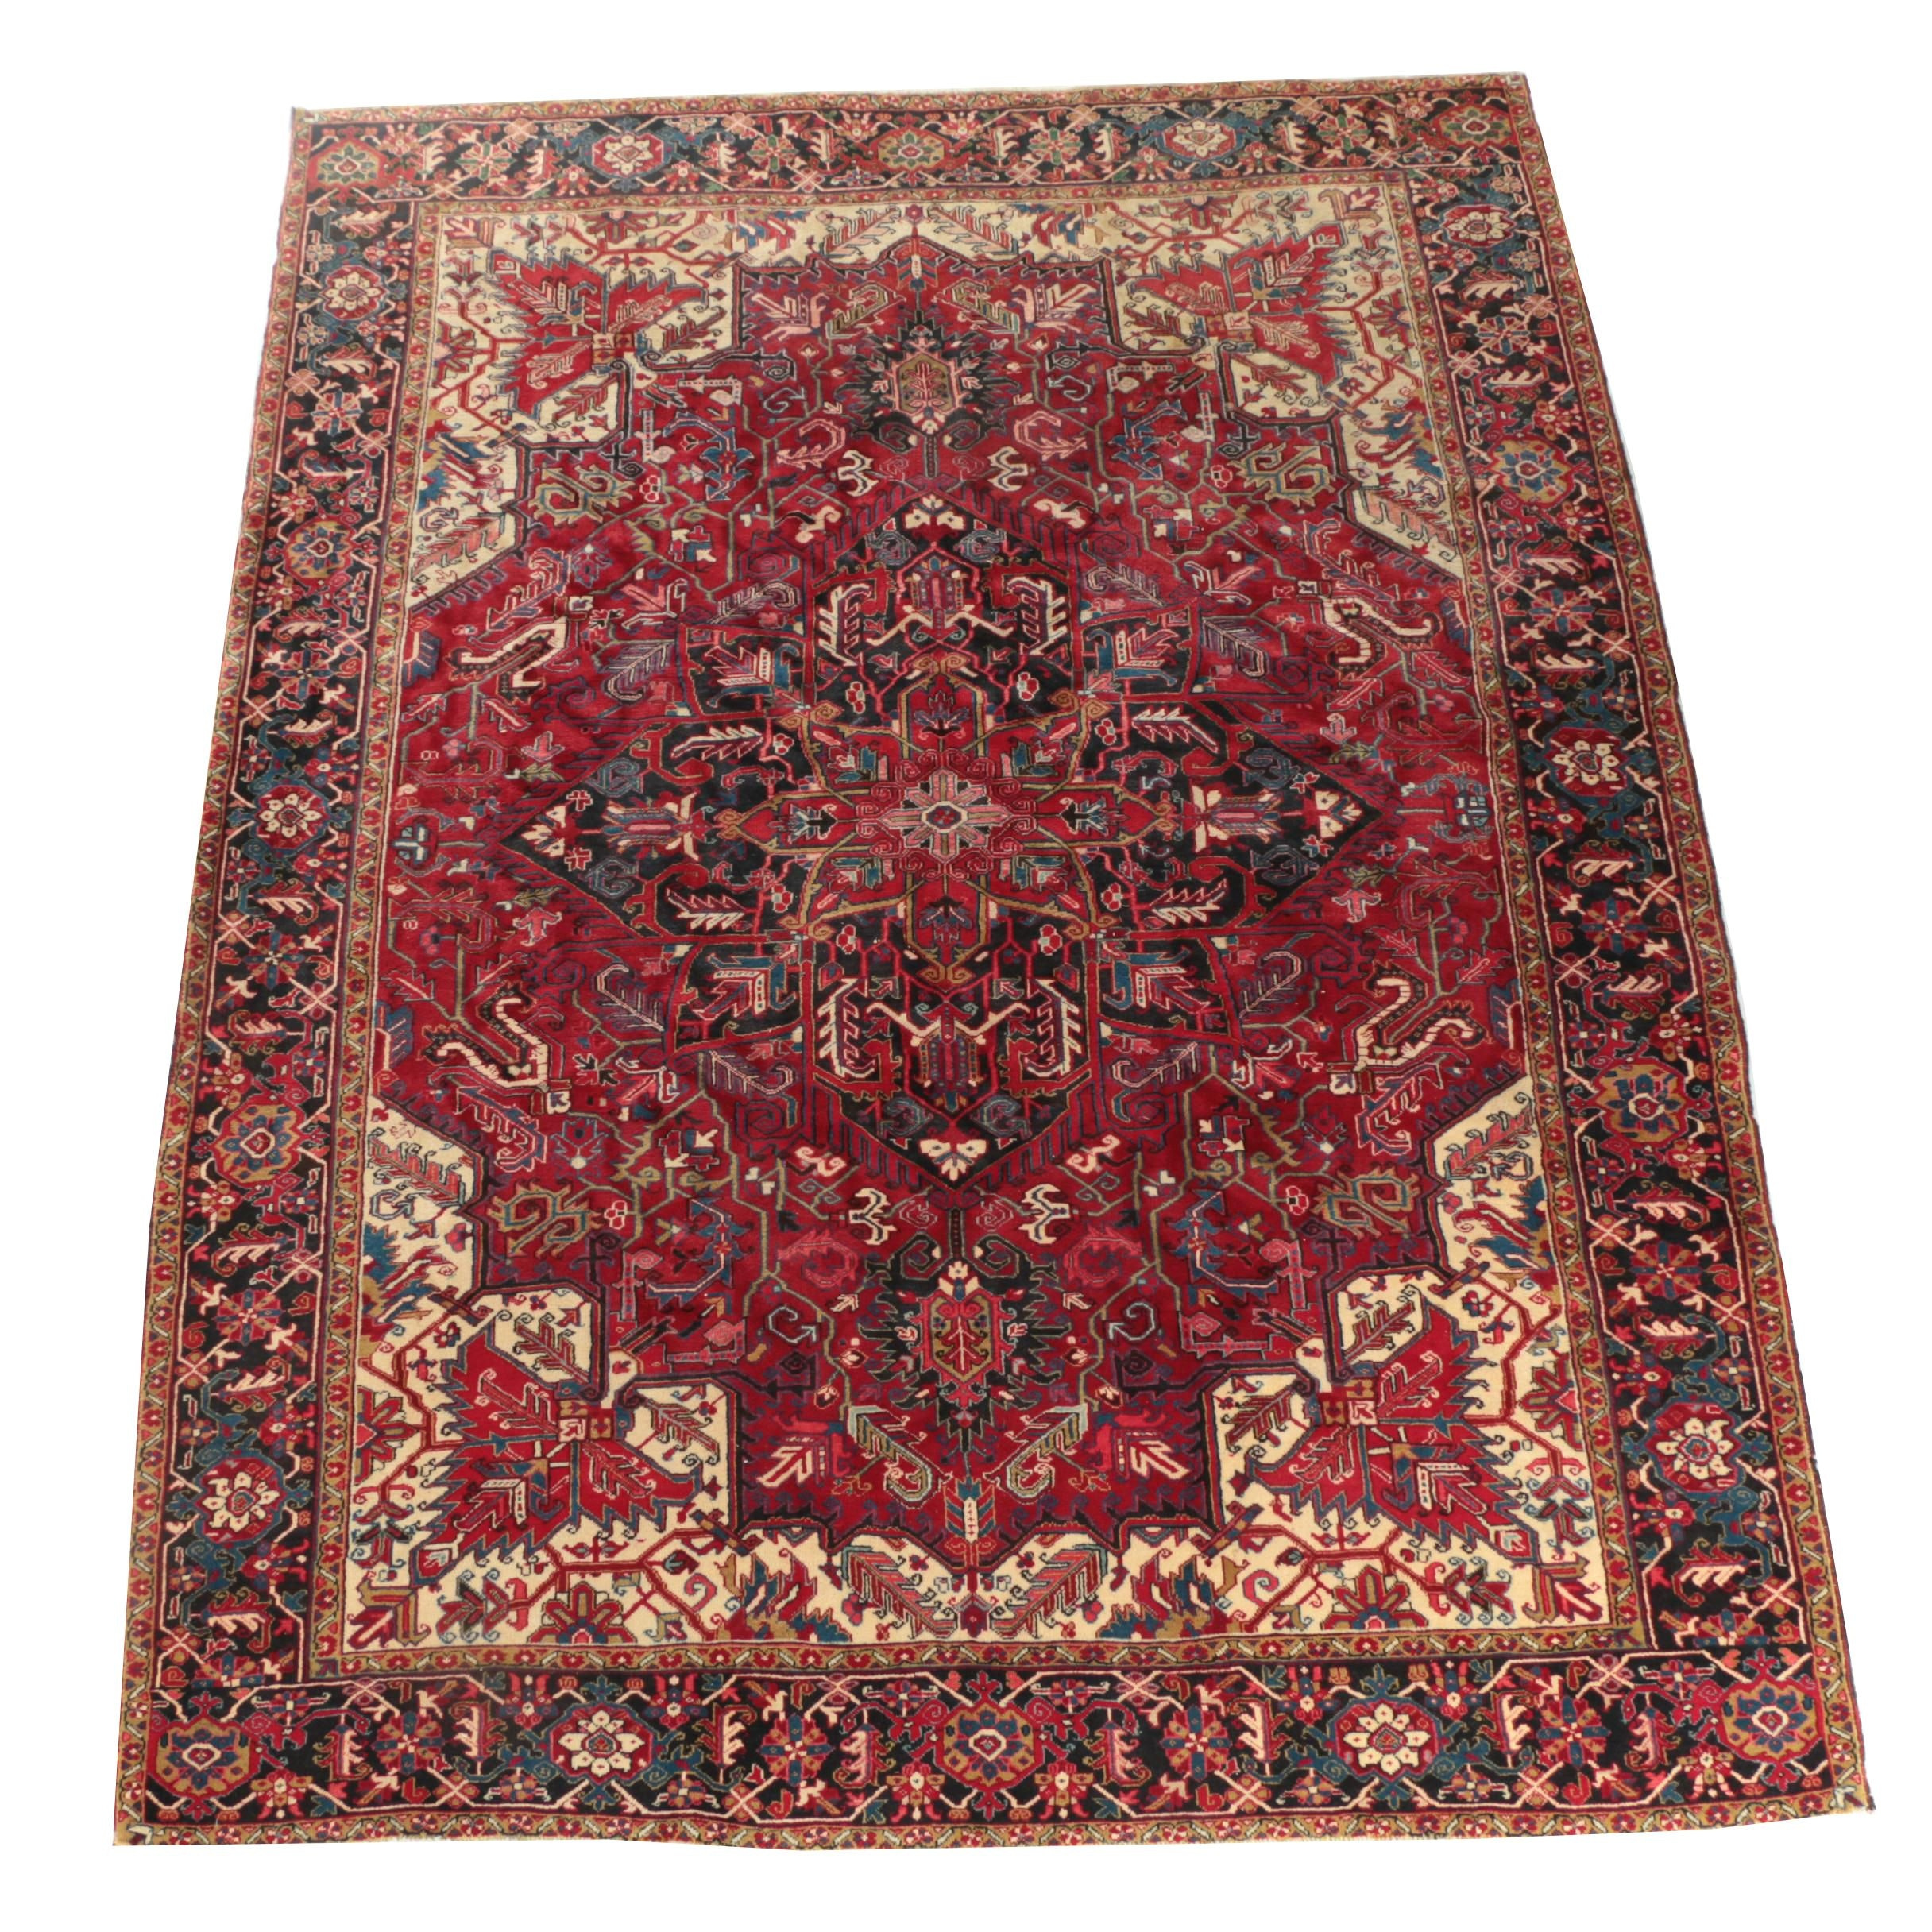 Hand-Knotted Persian Heriz Serapi Wool Room Sized Rug